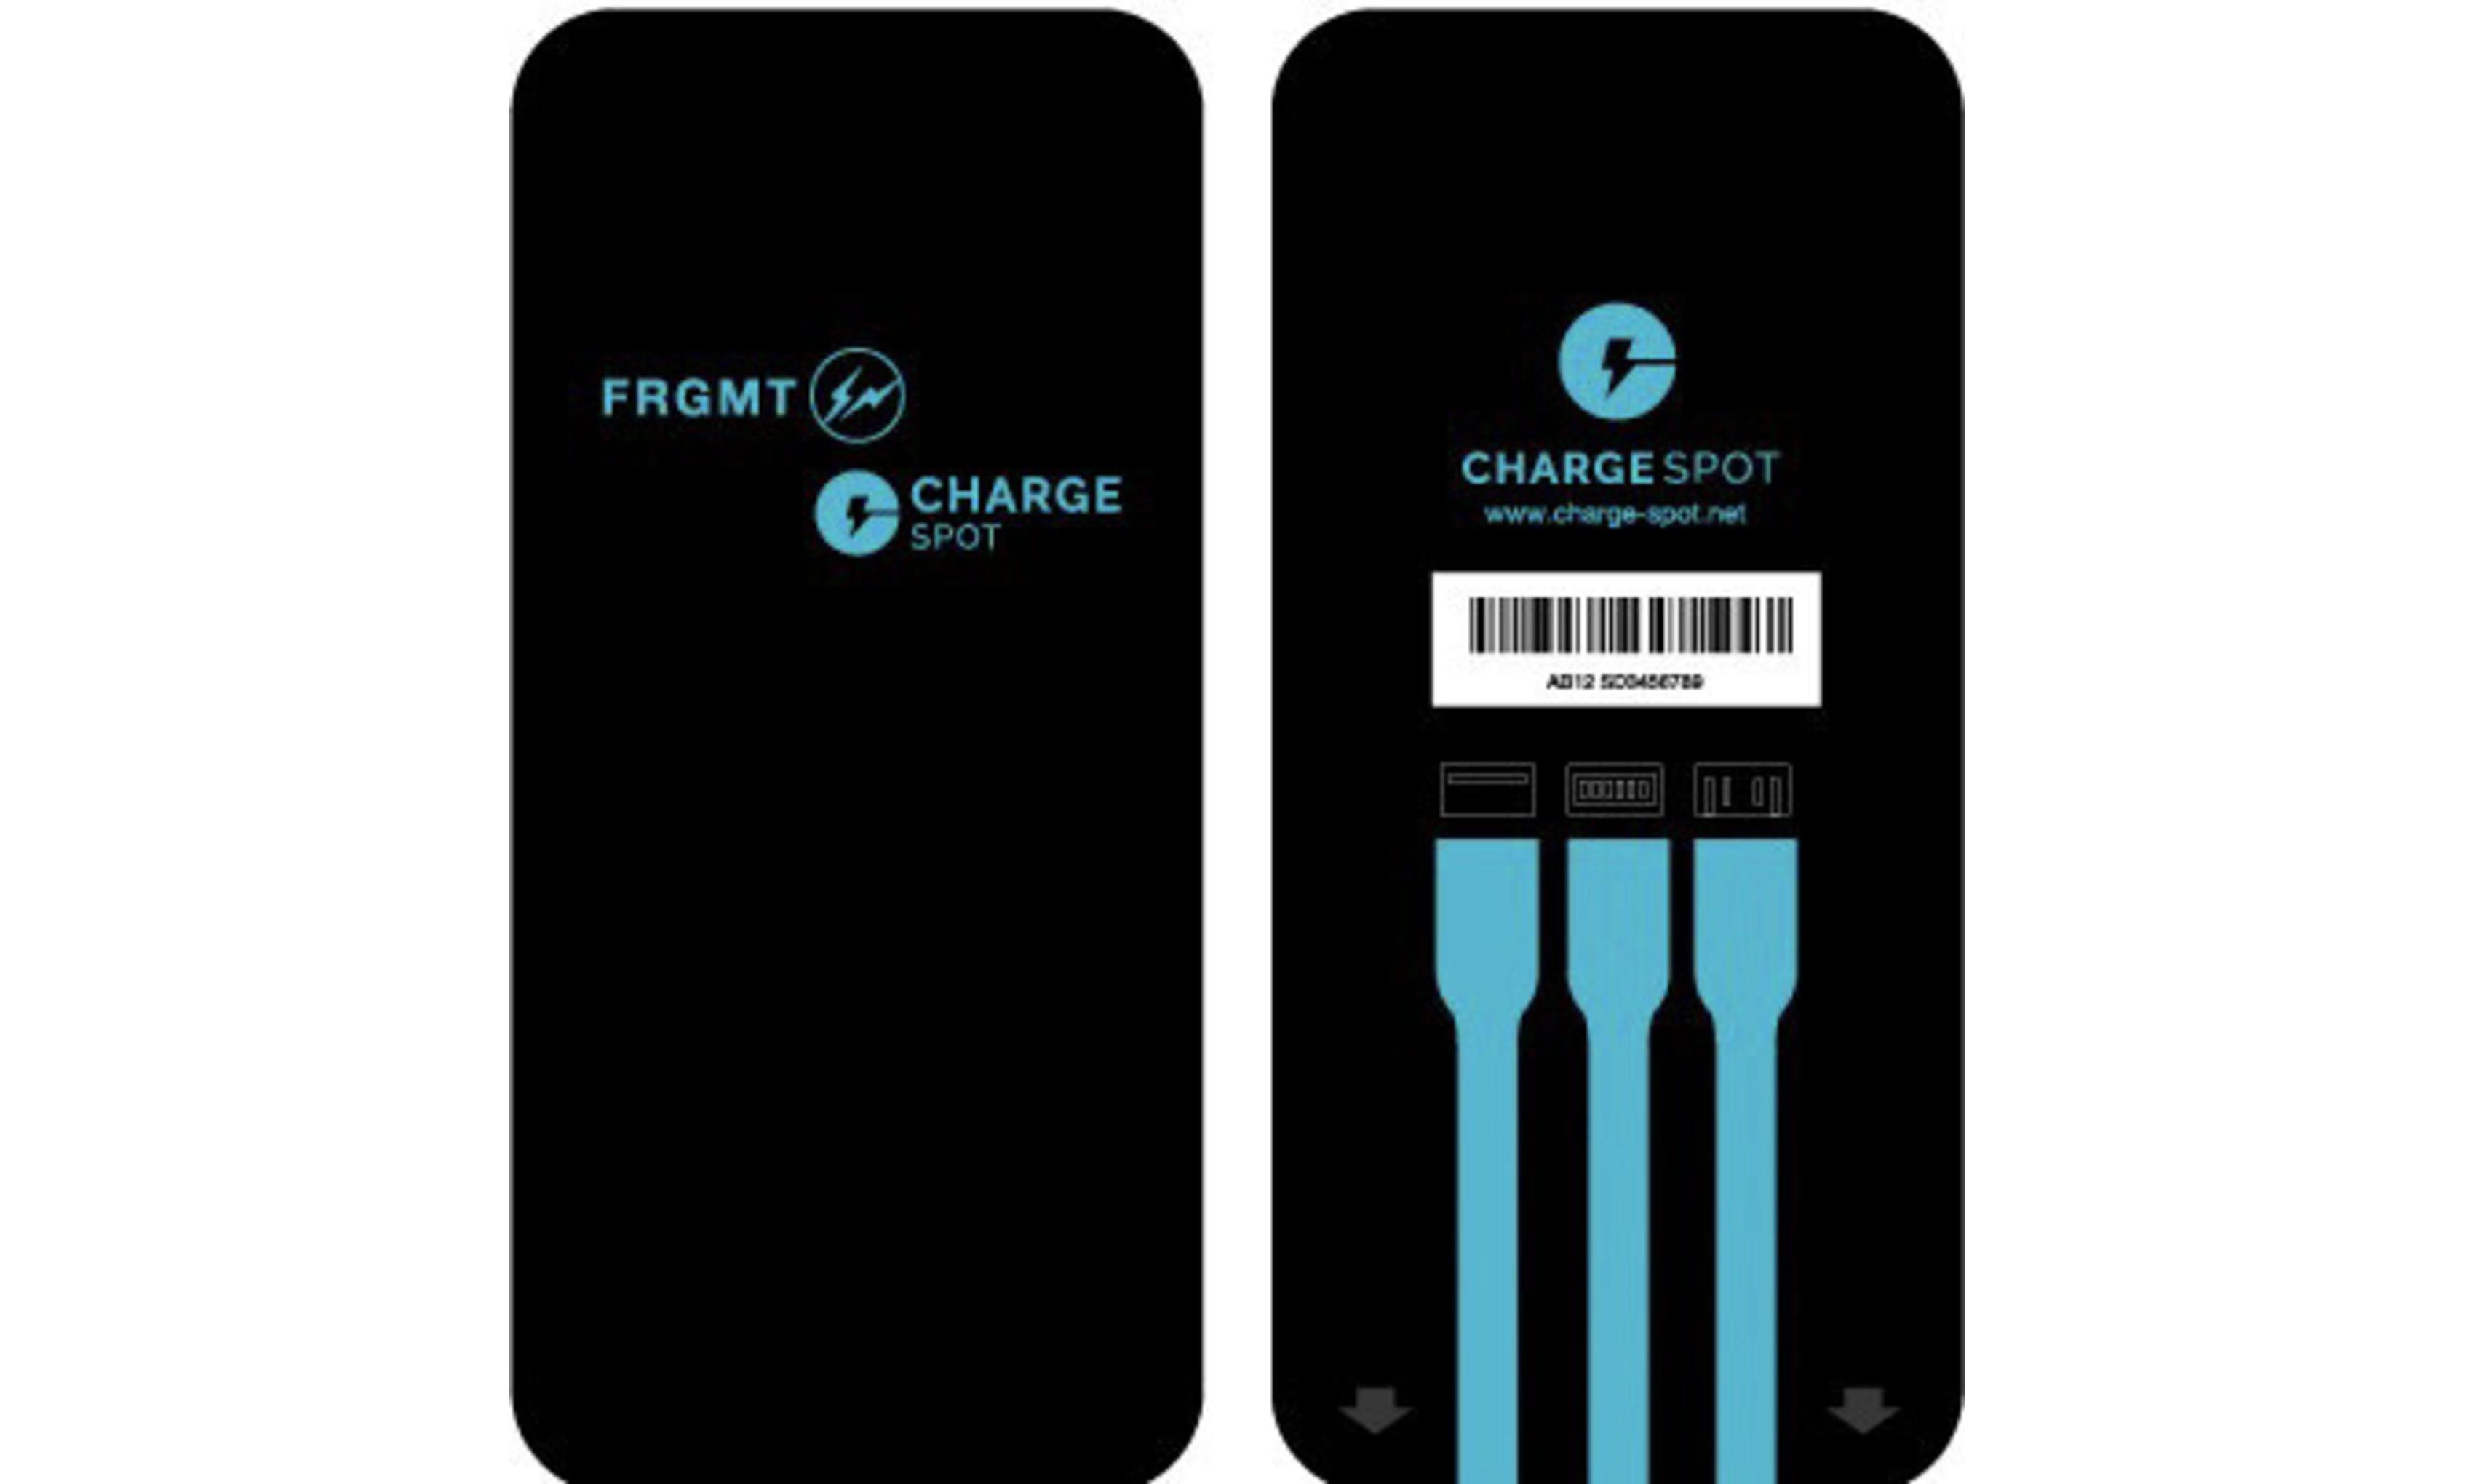 「可以借」的闪电,ChargeSPOT x fragment design 联名共享充电宝发布